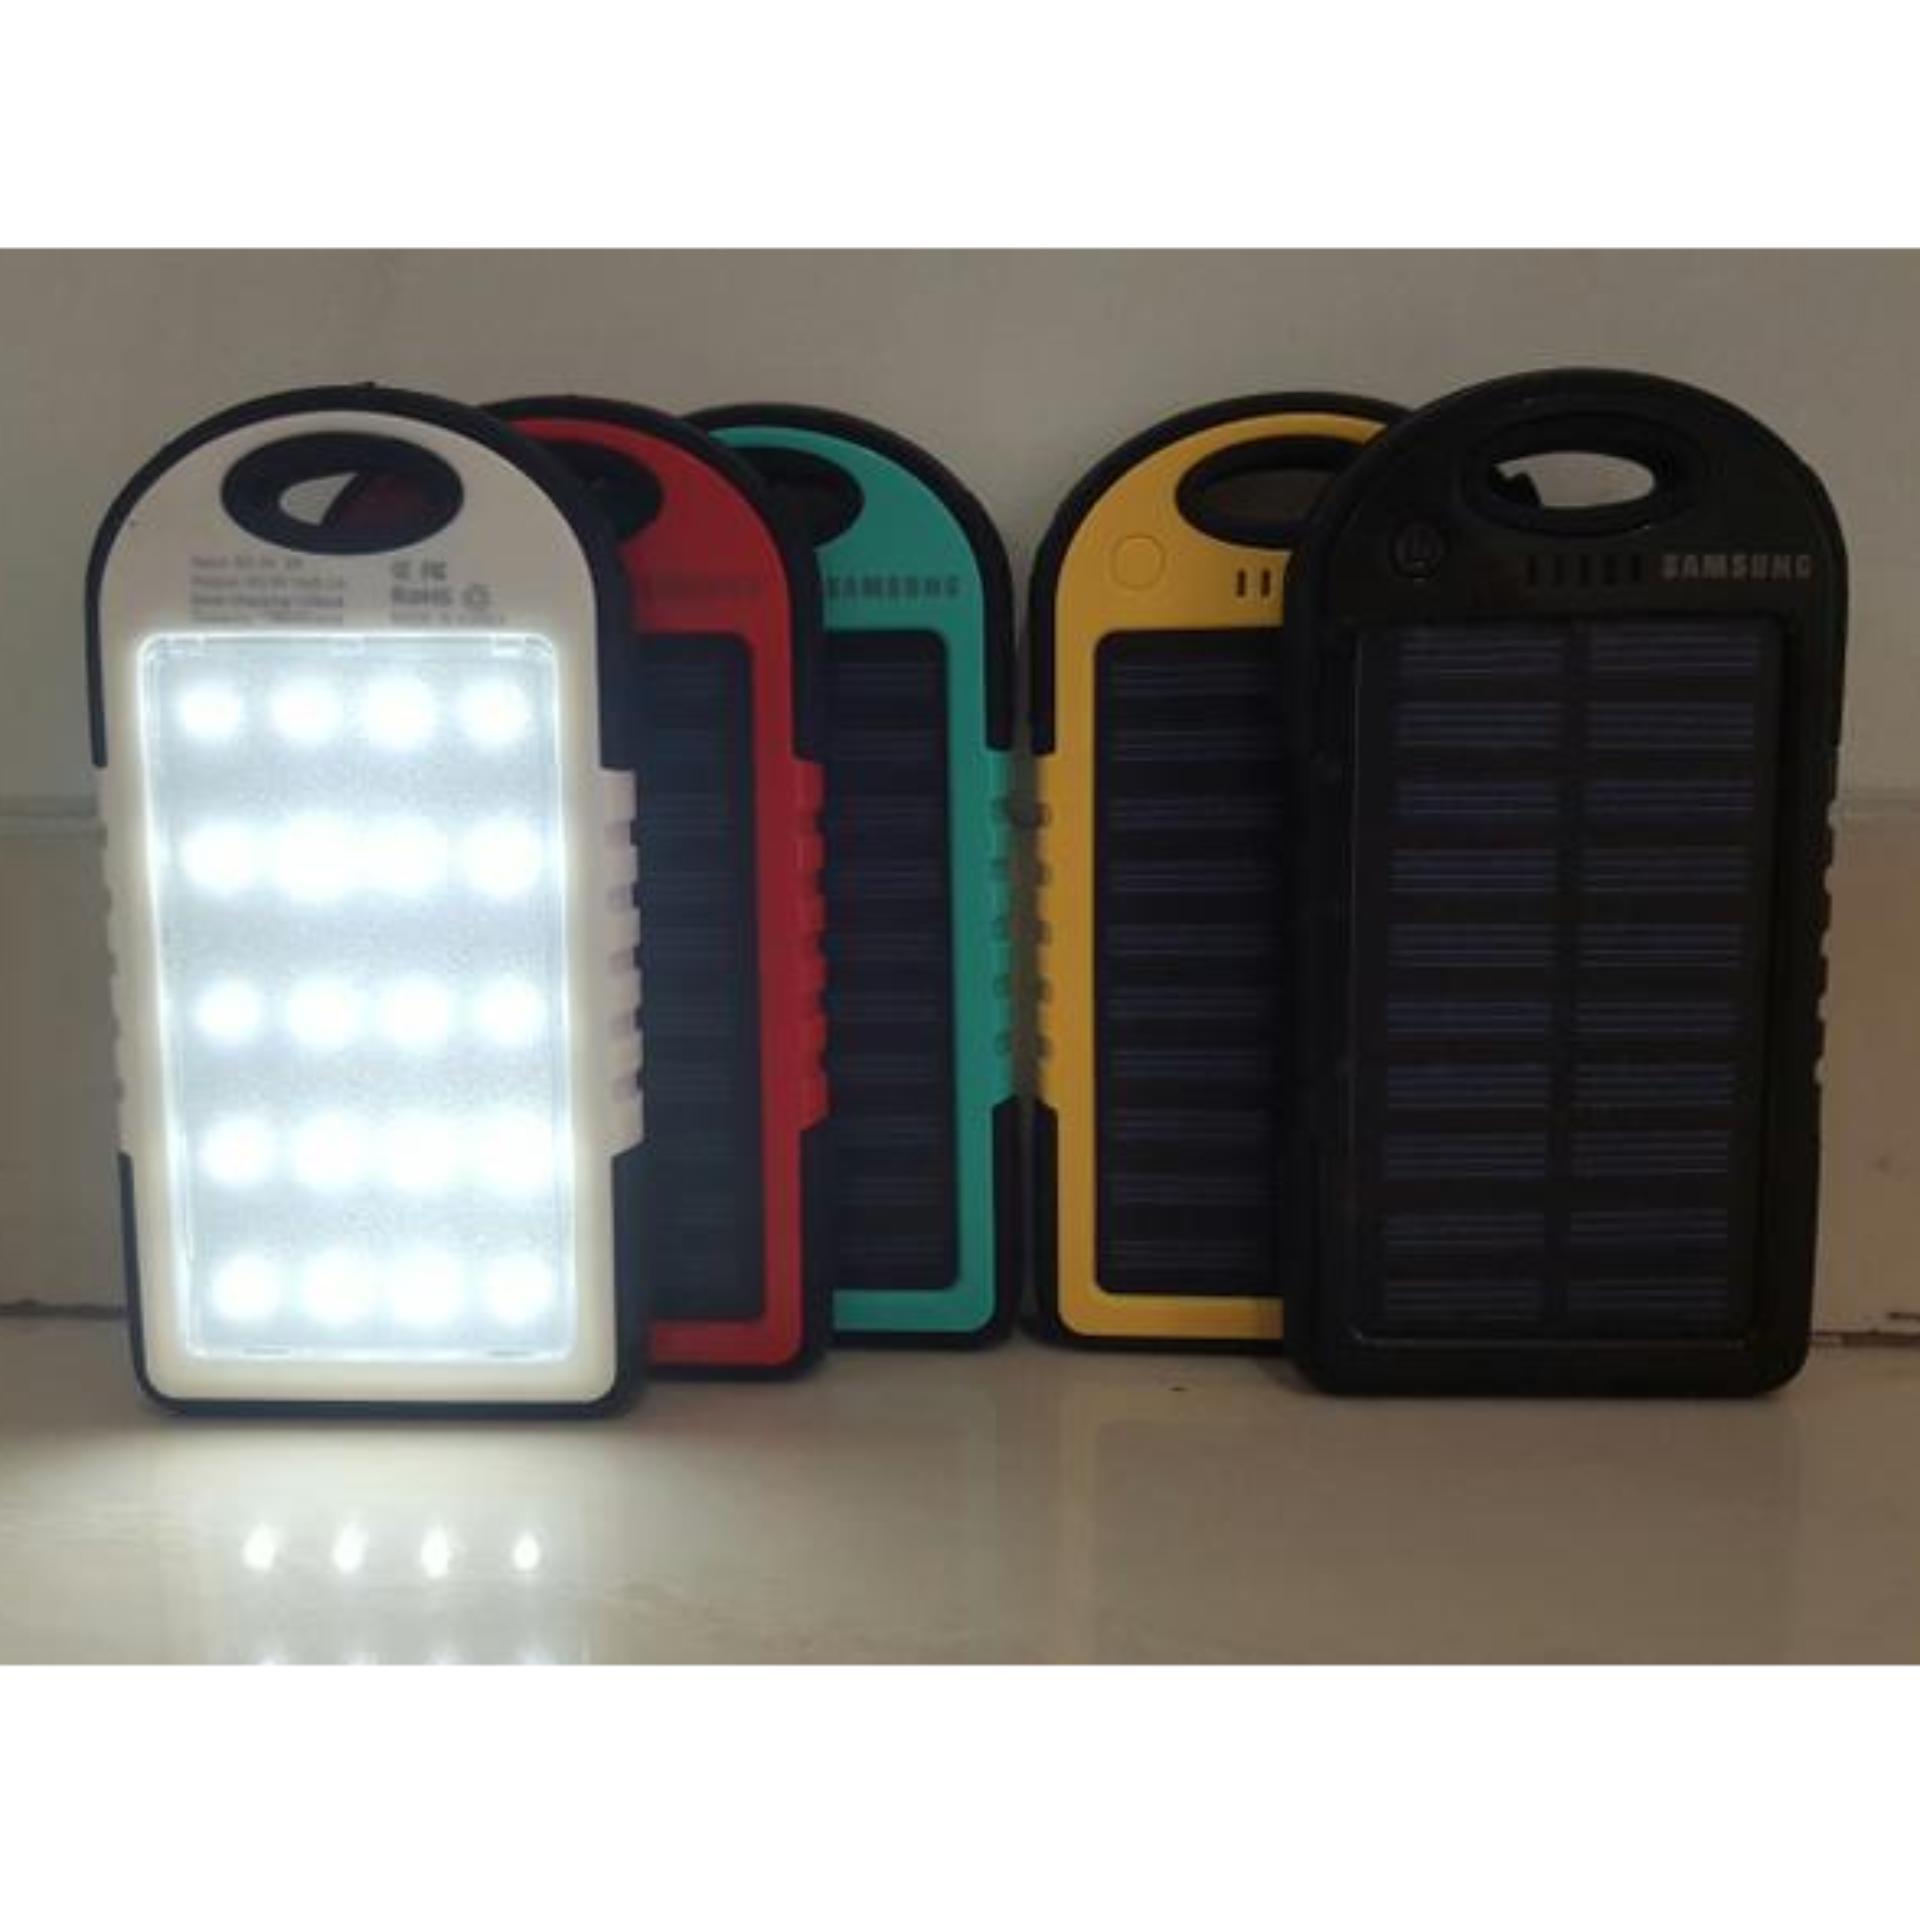 Powerbank Xiaomi 99000 Terbaru 99000mah Slim Stainless Solar 20 Led